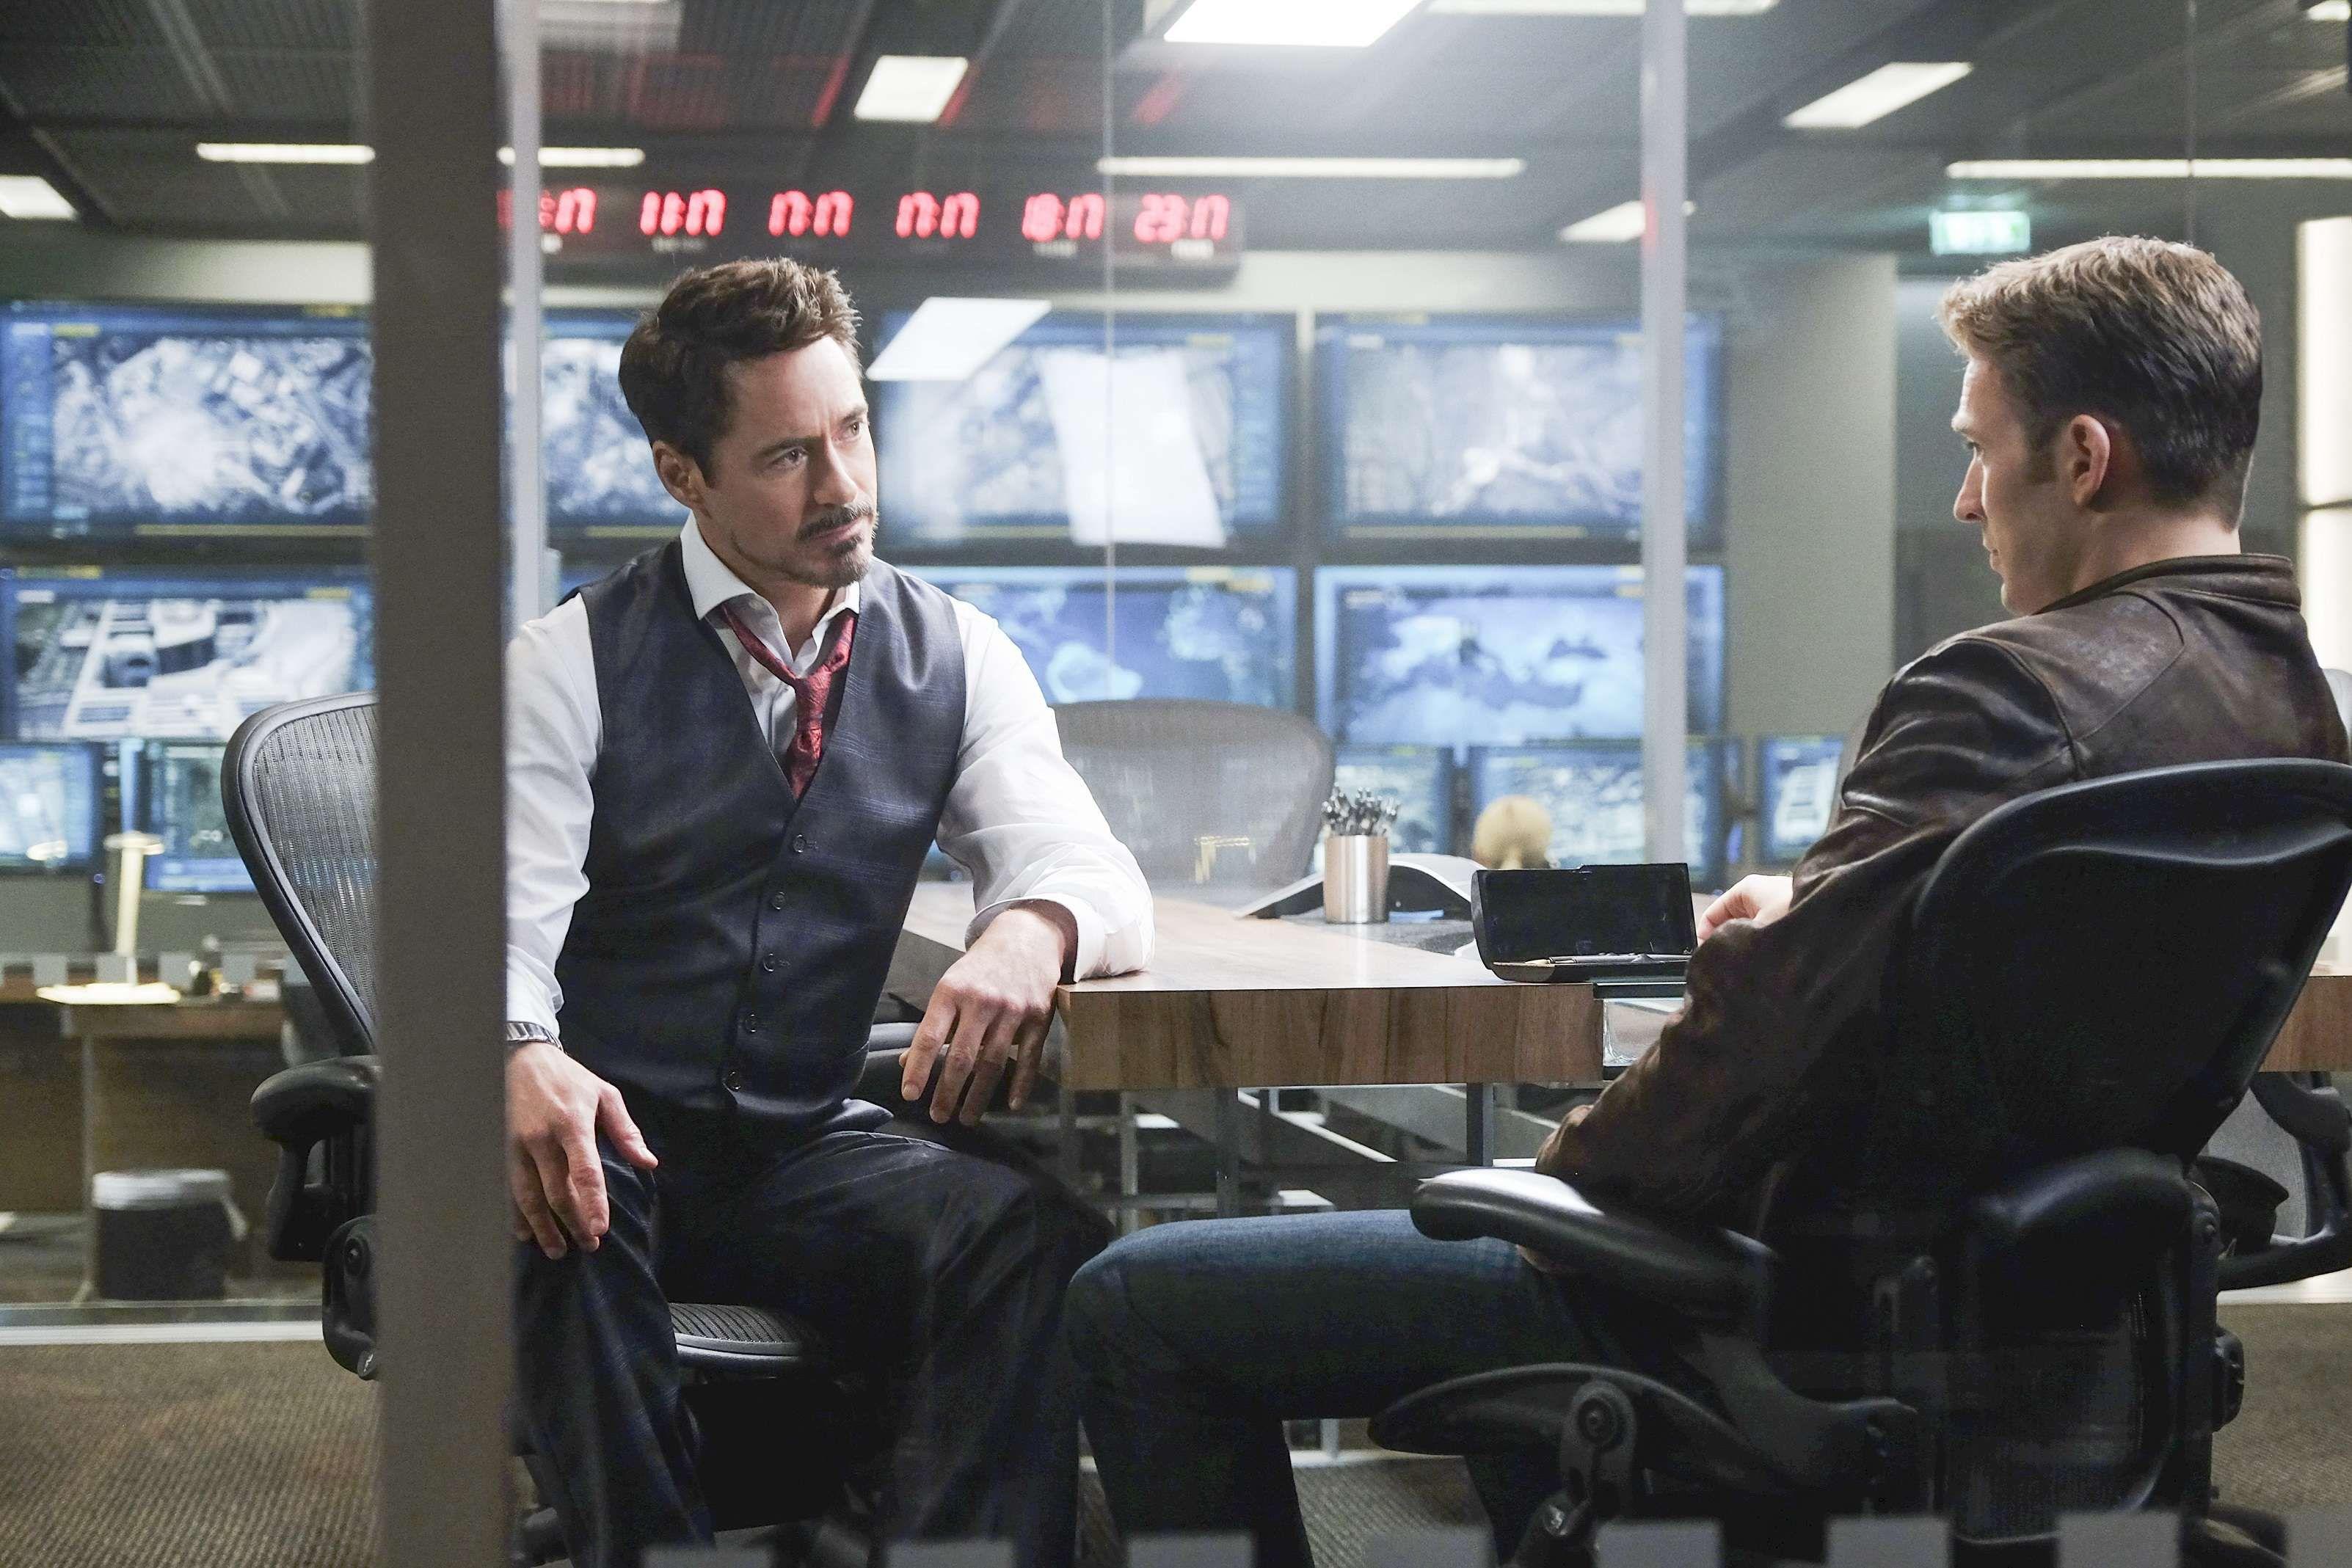 Robert Downey Jr. and Chris Evans as Tony Stark/Iron Man and Steve Rogers/Captain America in Captain America: Civil War (2016).